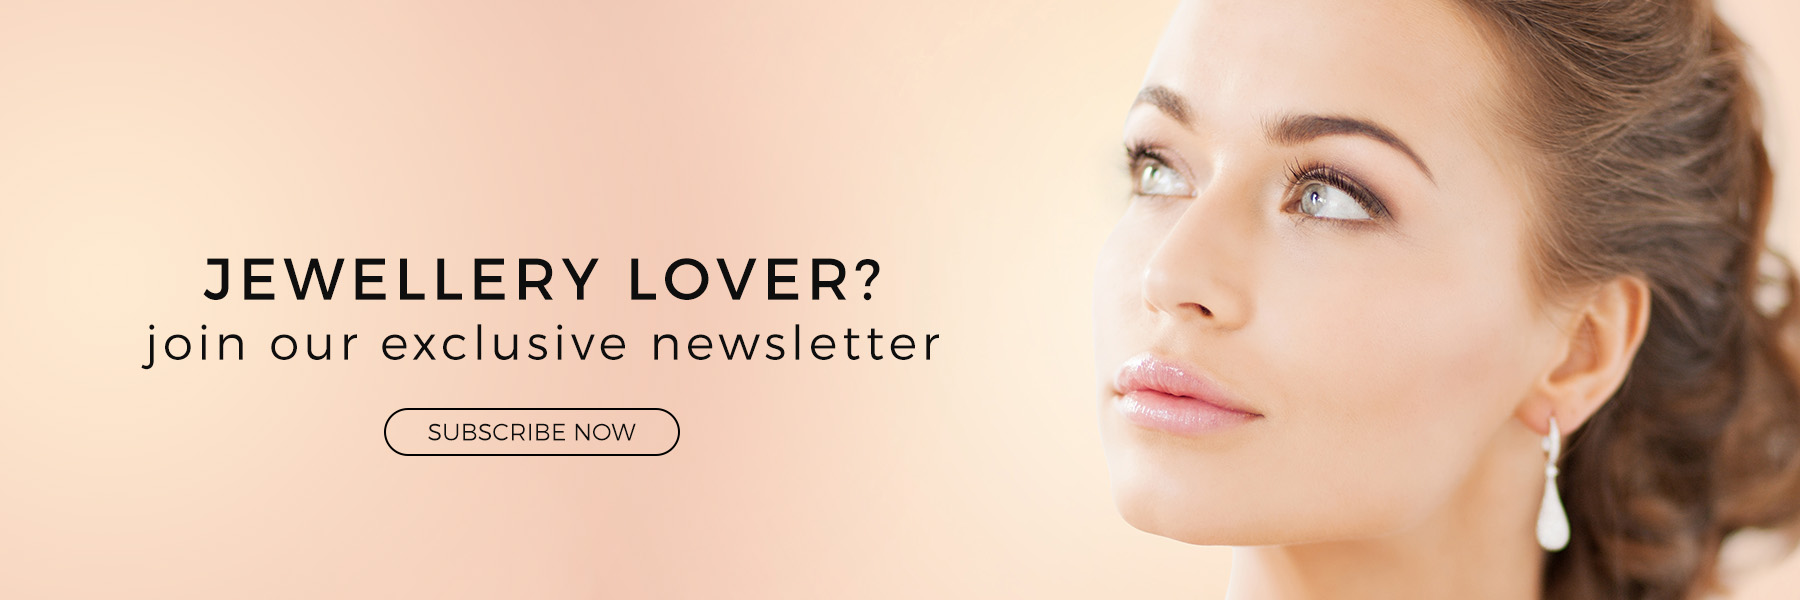 exclusive jewellery newsletter